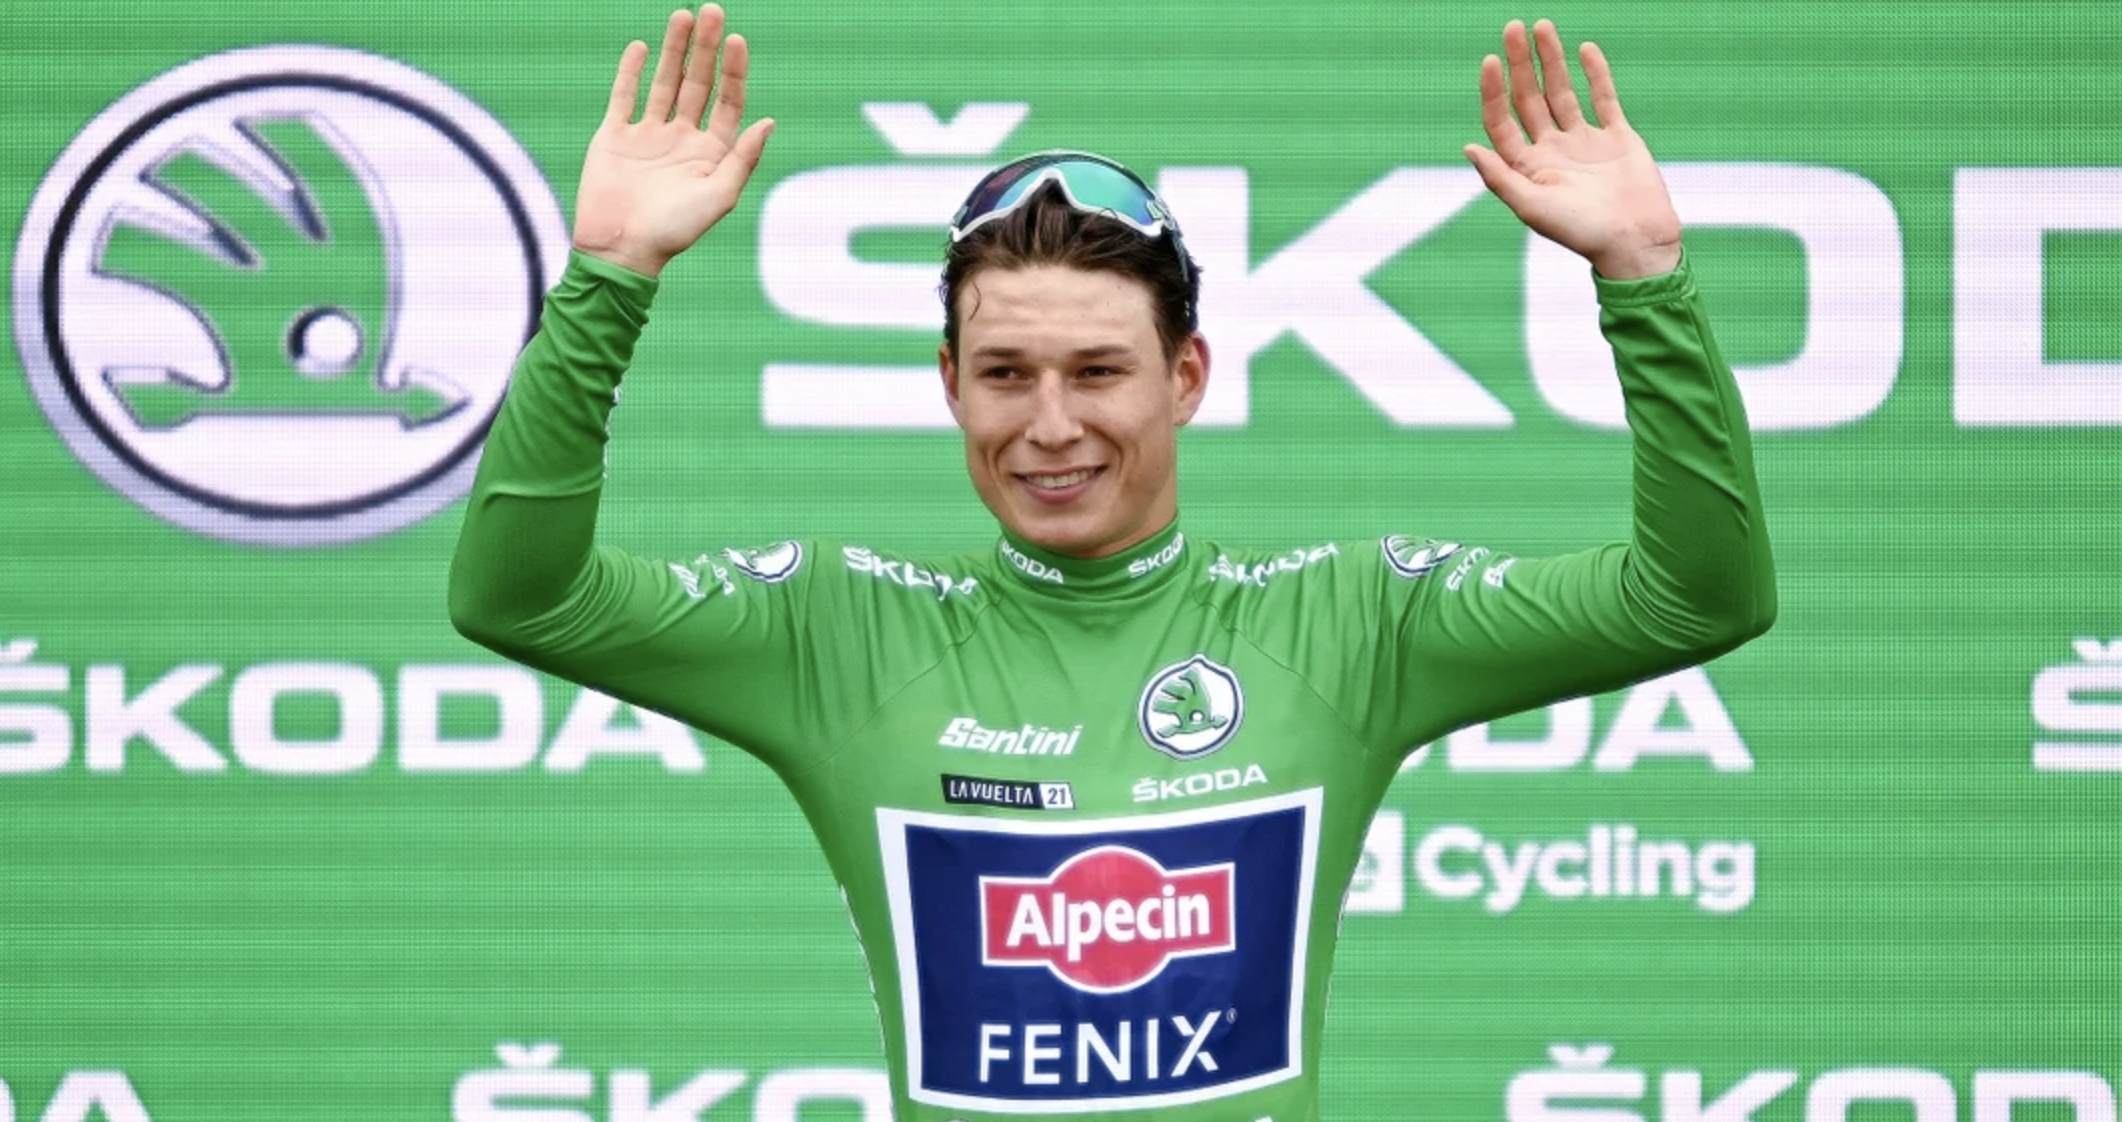 Vuelta 2021: Jasper Philipsen vince la 5^ tappa